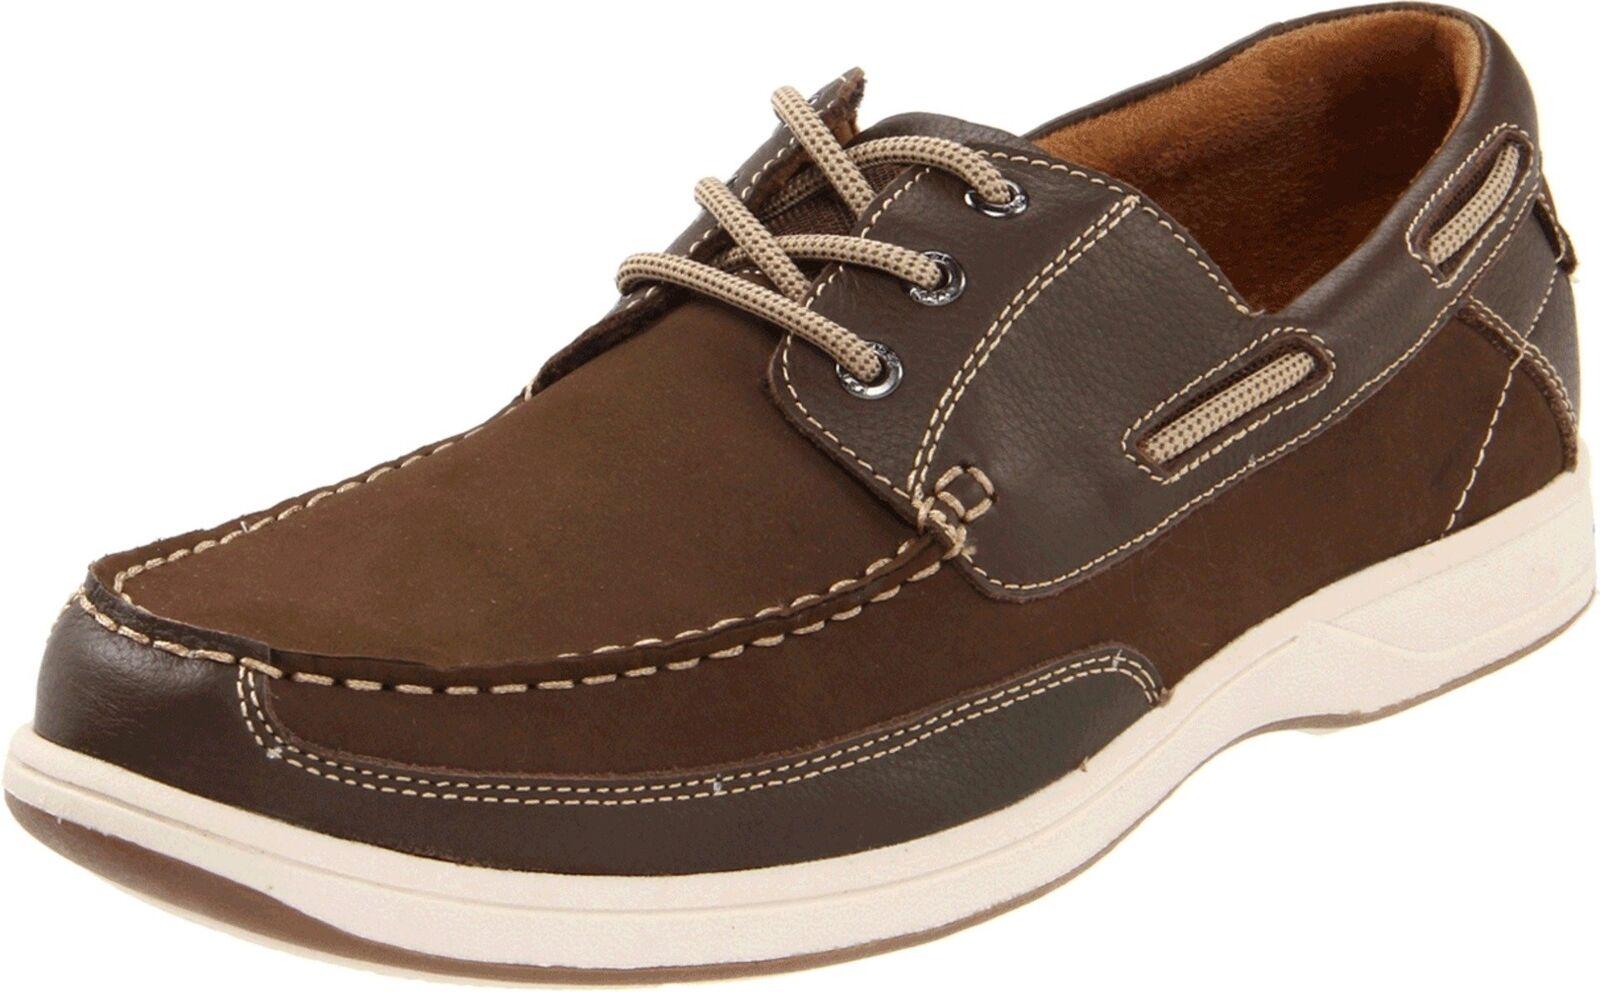 Florsheim Men's Lakeside Lakeside Lakeside Boat shoes Brown 8 D(M) US ec0824